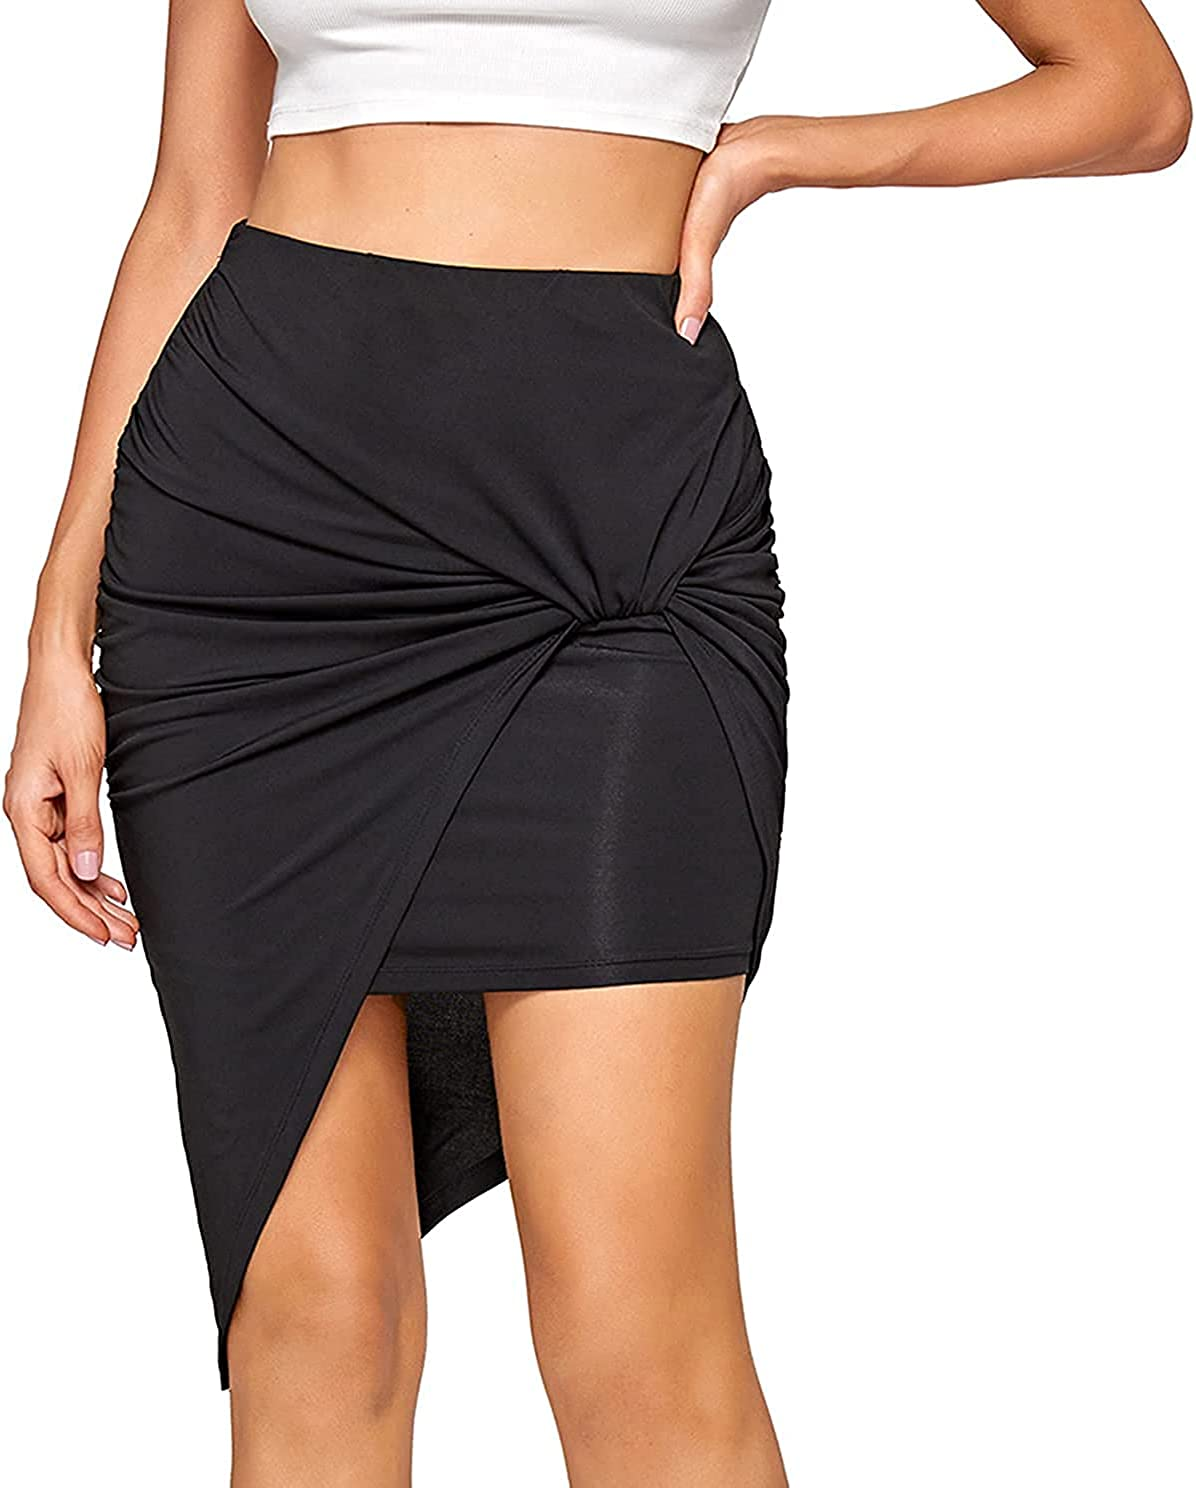 Ranle Women's Stretch High Waist Draped Skirt Bohemian Asymmetric Mini Skirt